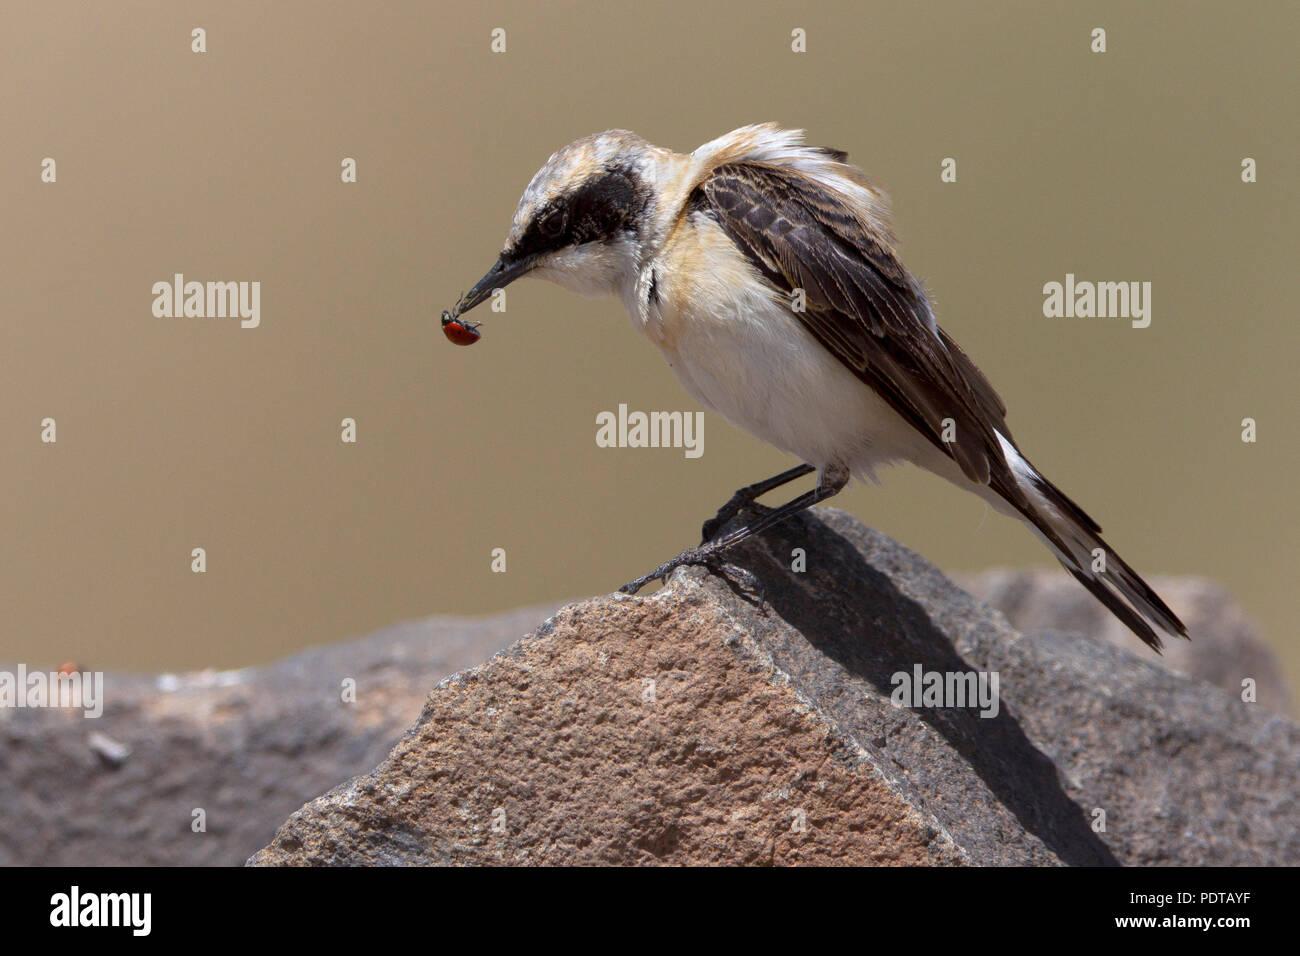 Oostelijke Blonde Tapuit op rots met gevangen Lieveheersbeestje. Eastern Black-eared Wheatear on a rock with Ladybug as prey. Stock Photo